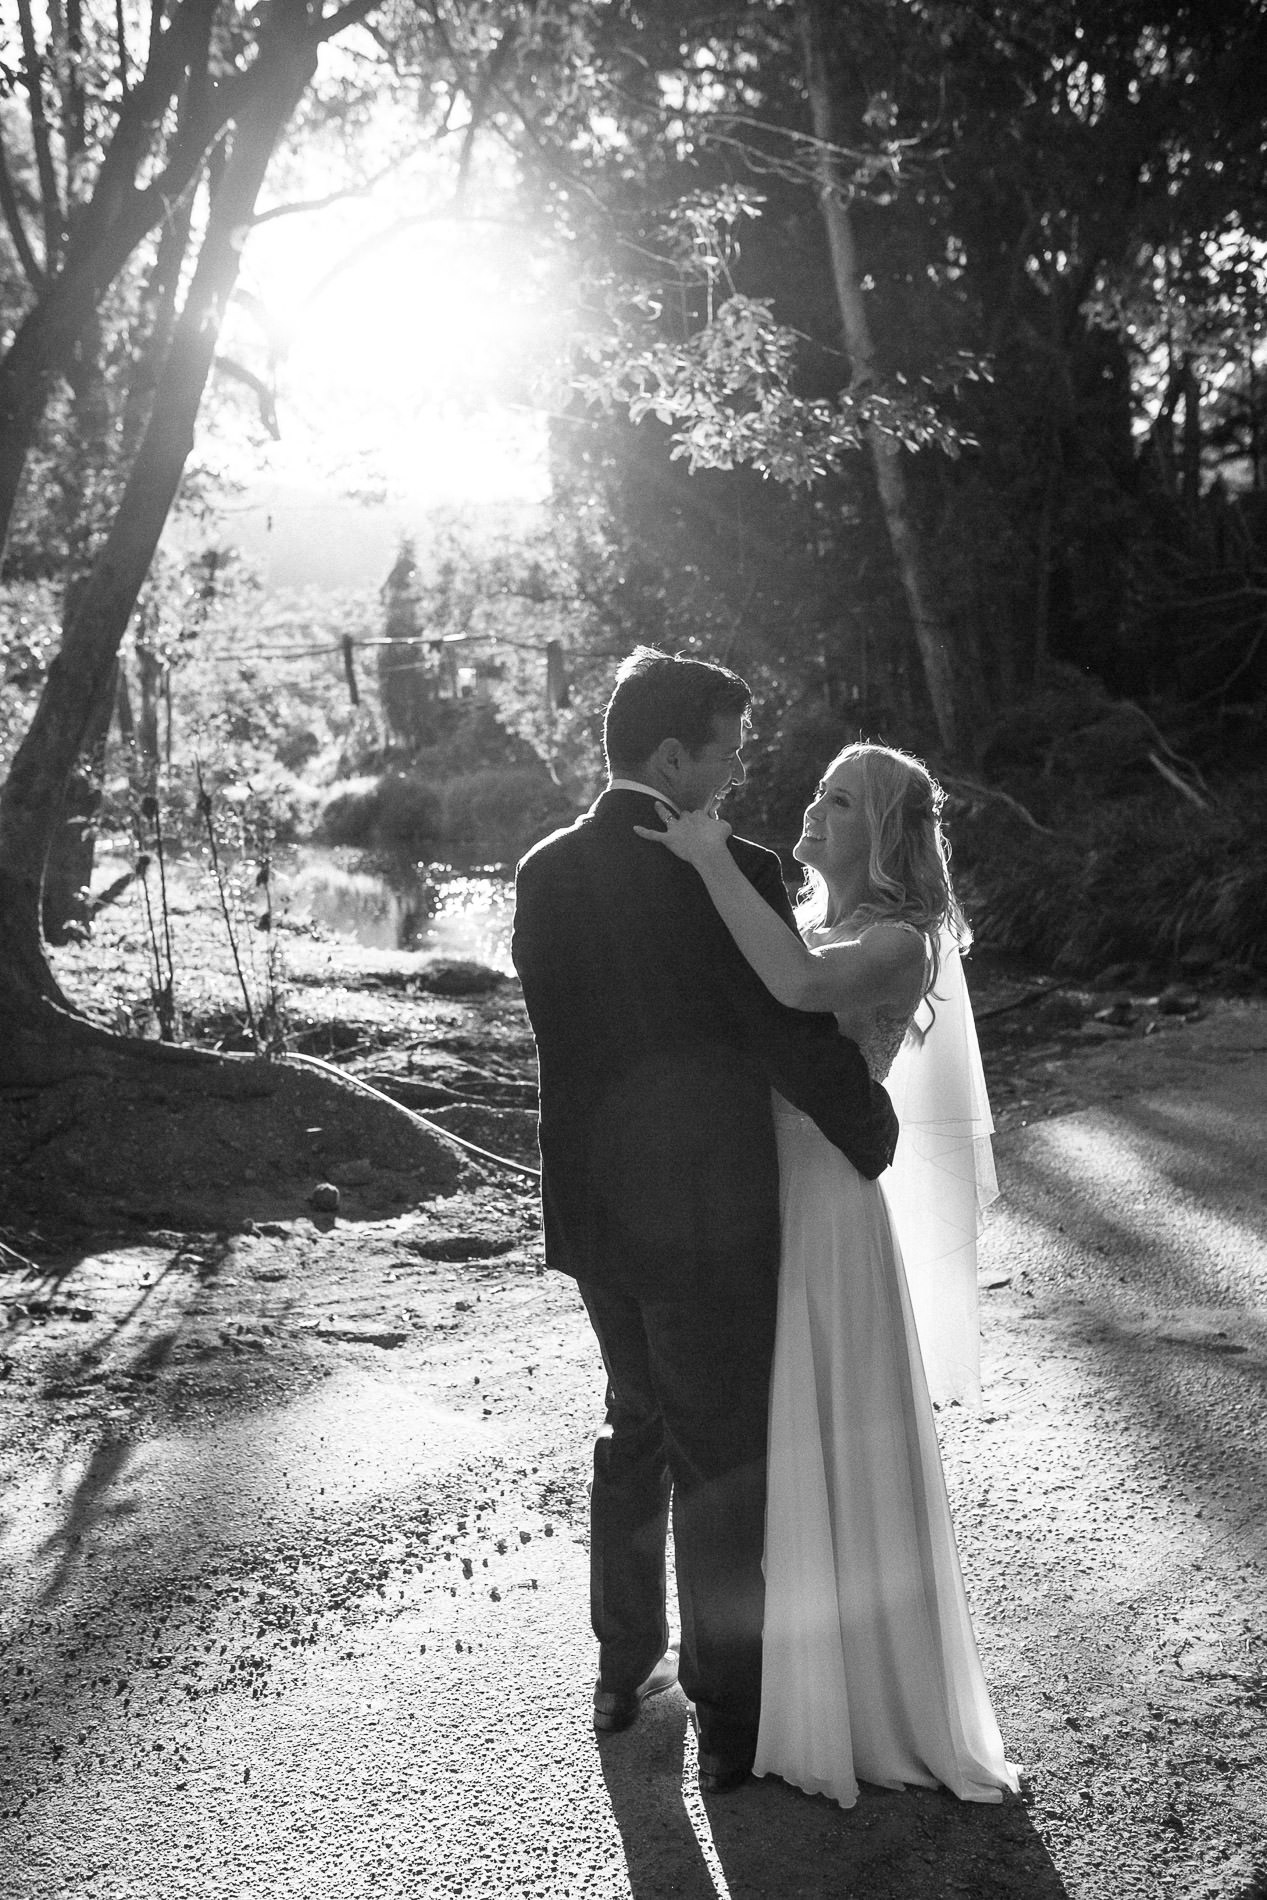 True North Photography_Boomerang Farm_Stacey and Isaac_Gold Coast Wedding_Barm Wedding_Hinterland Wedding-133.jpg